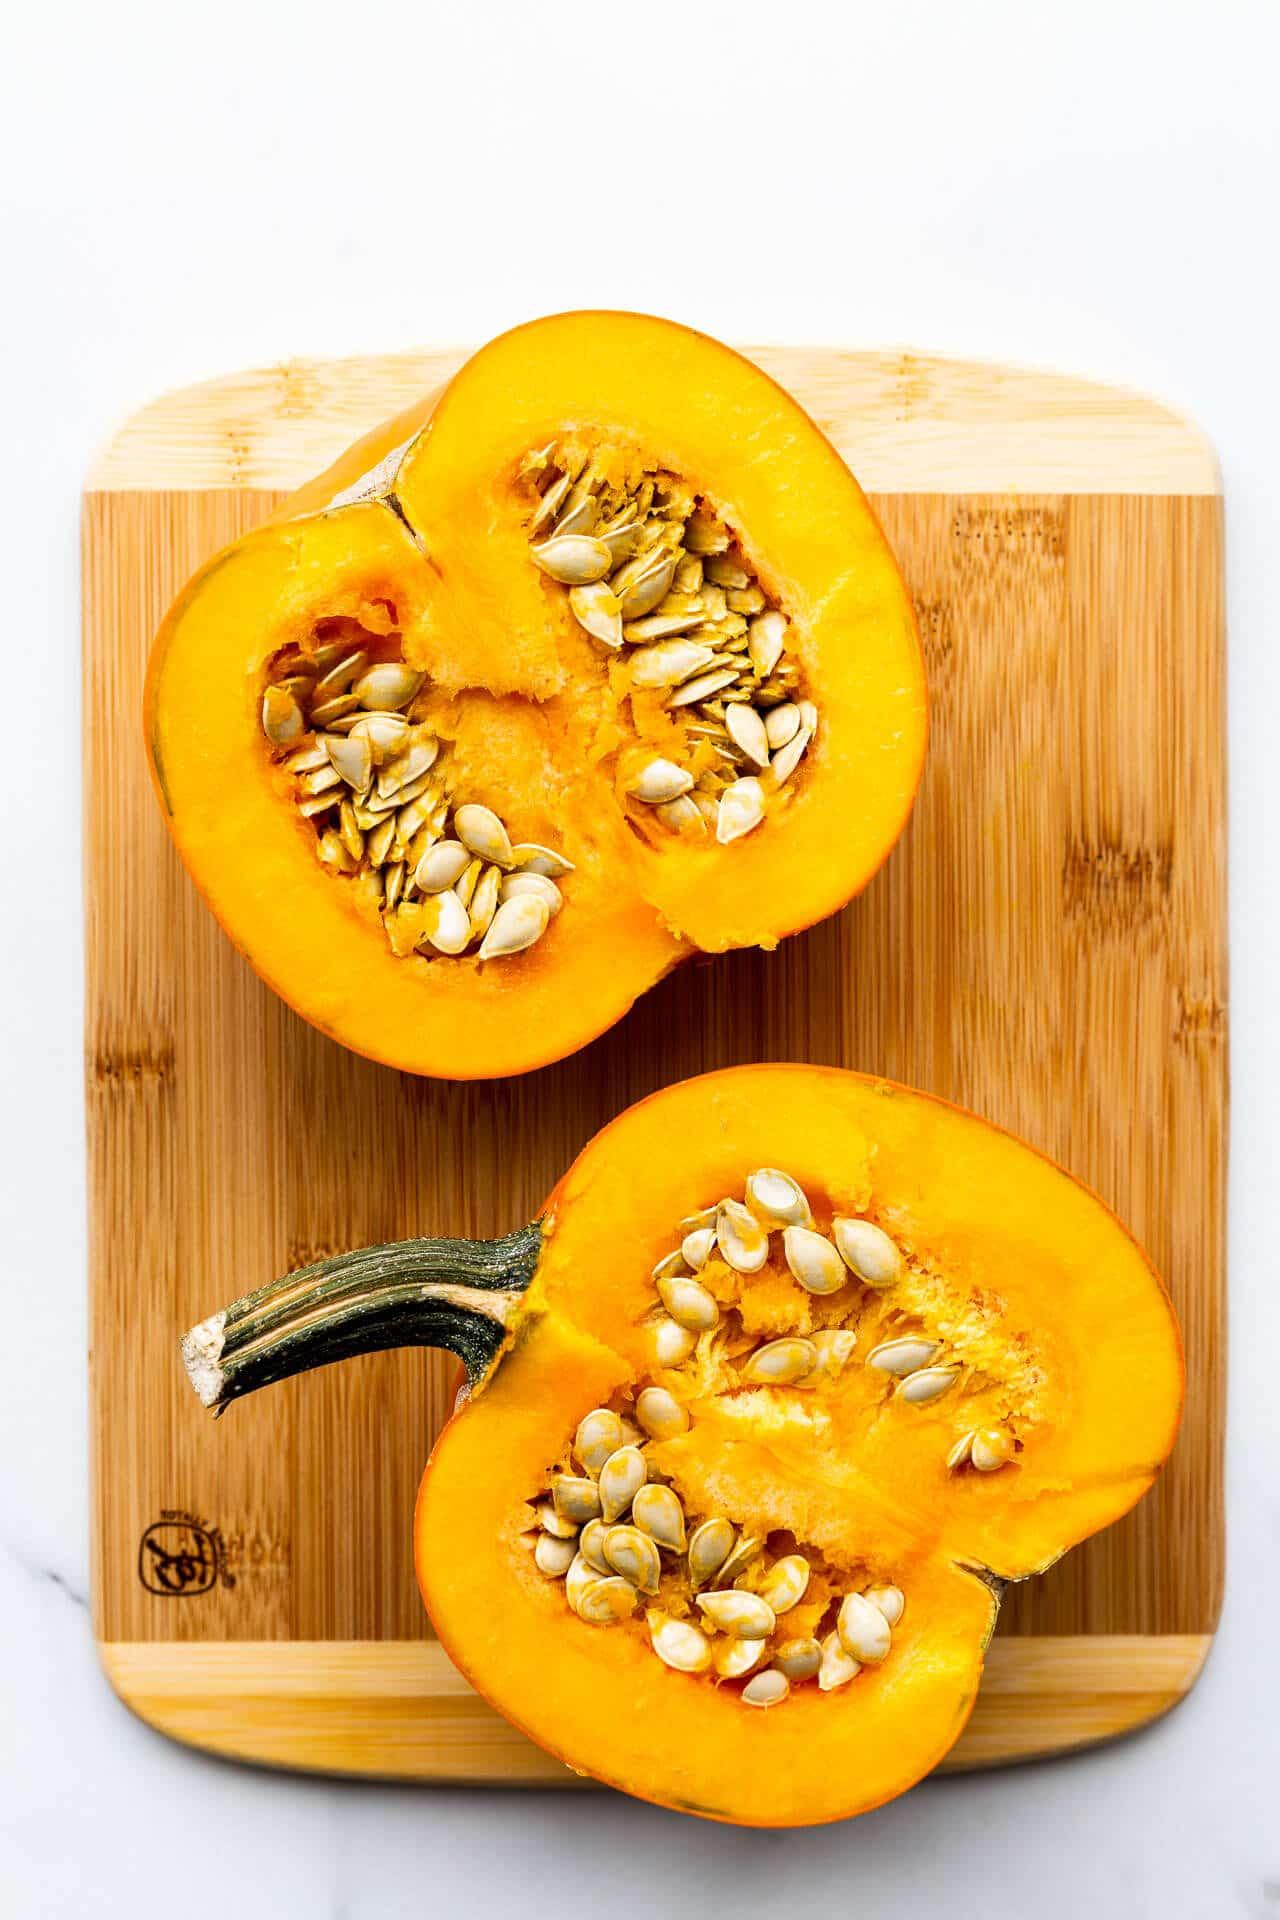 Sugar pie pumpkin cut in half to reveal flesh and seeds on a wood cutting board.